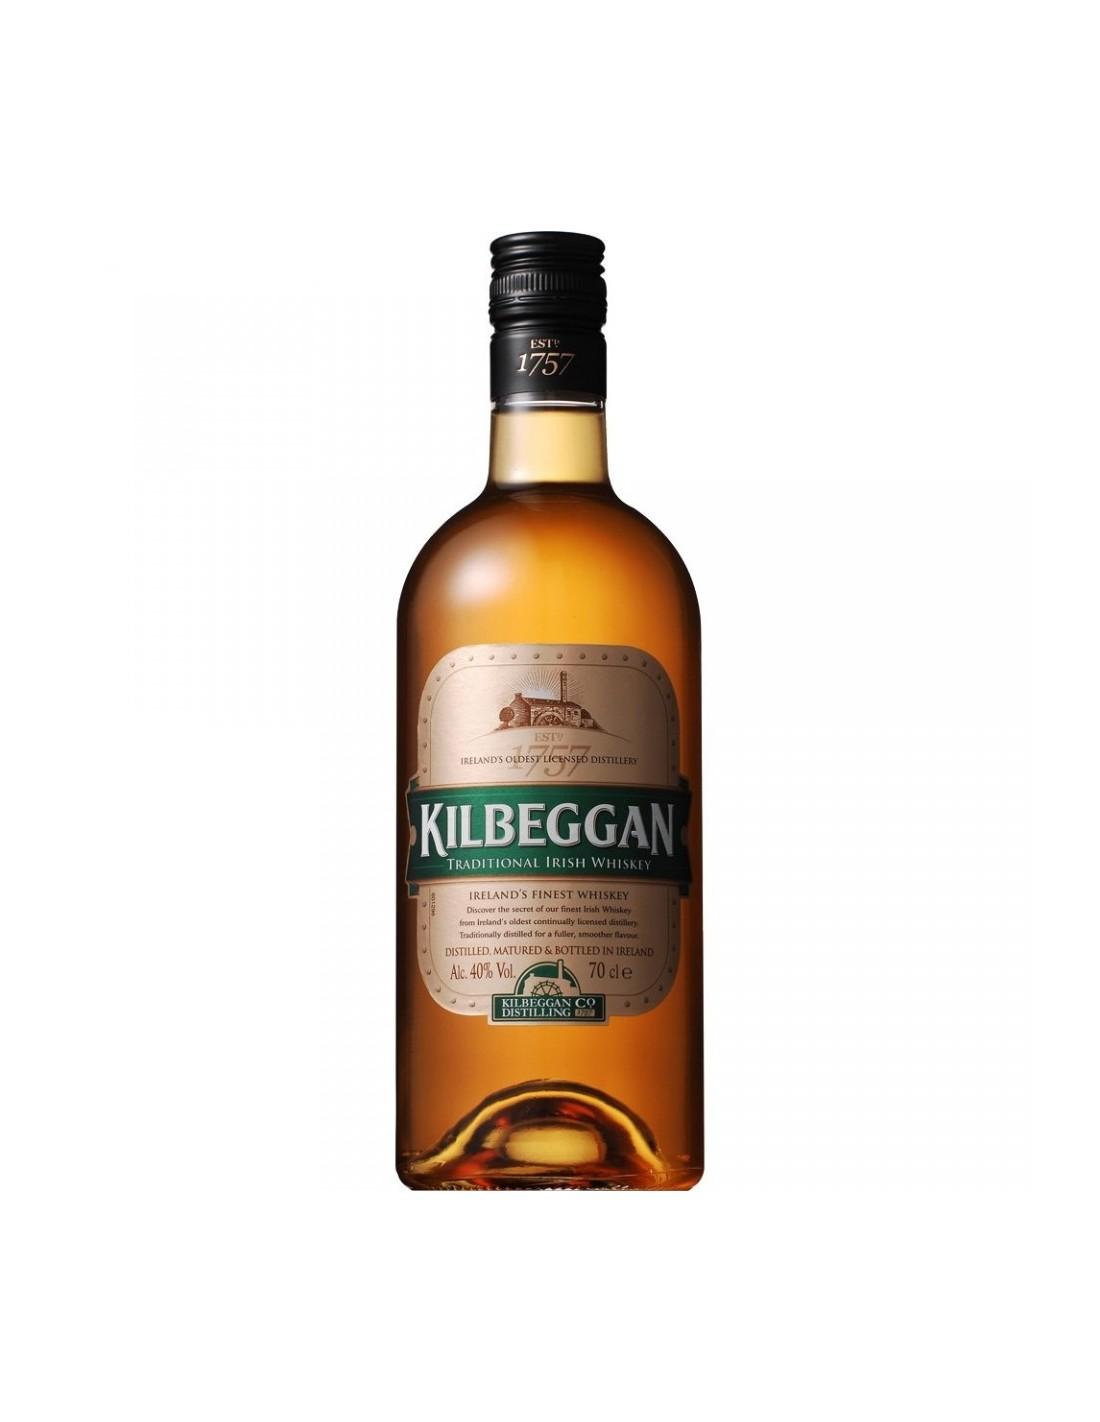 Whisky Kilbeggan, 40% alc., 0.7L, Irlanda